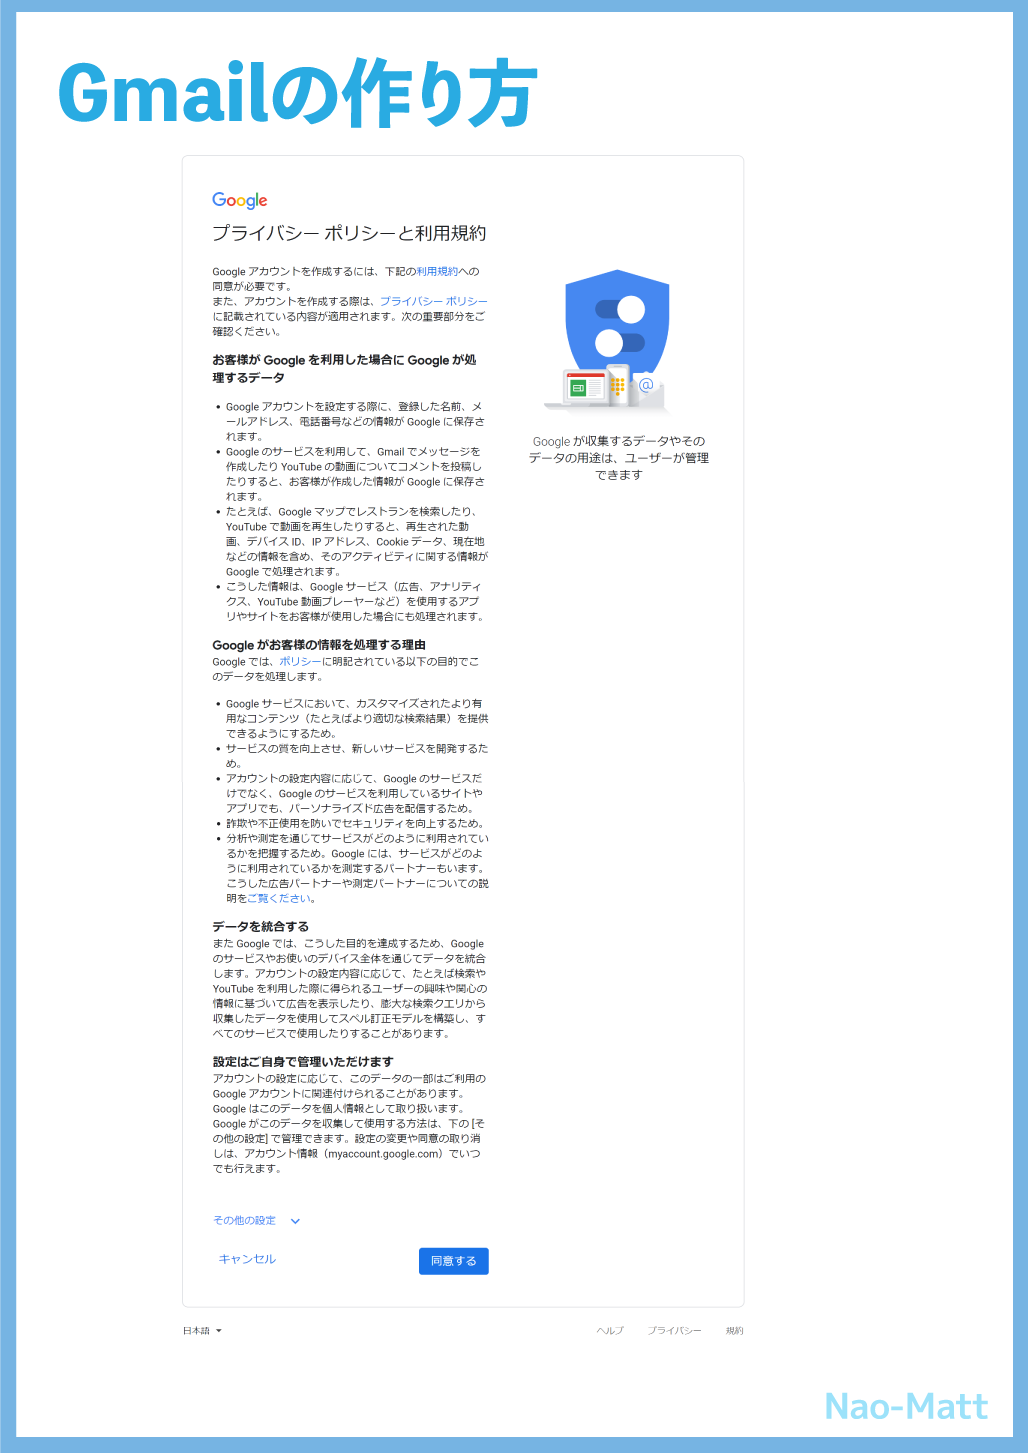 Gmail利用規約画面です